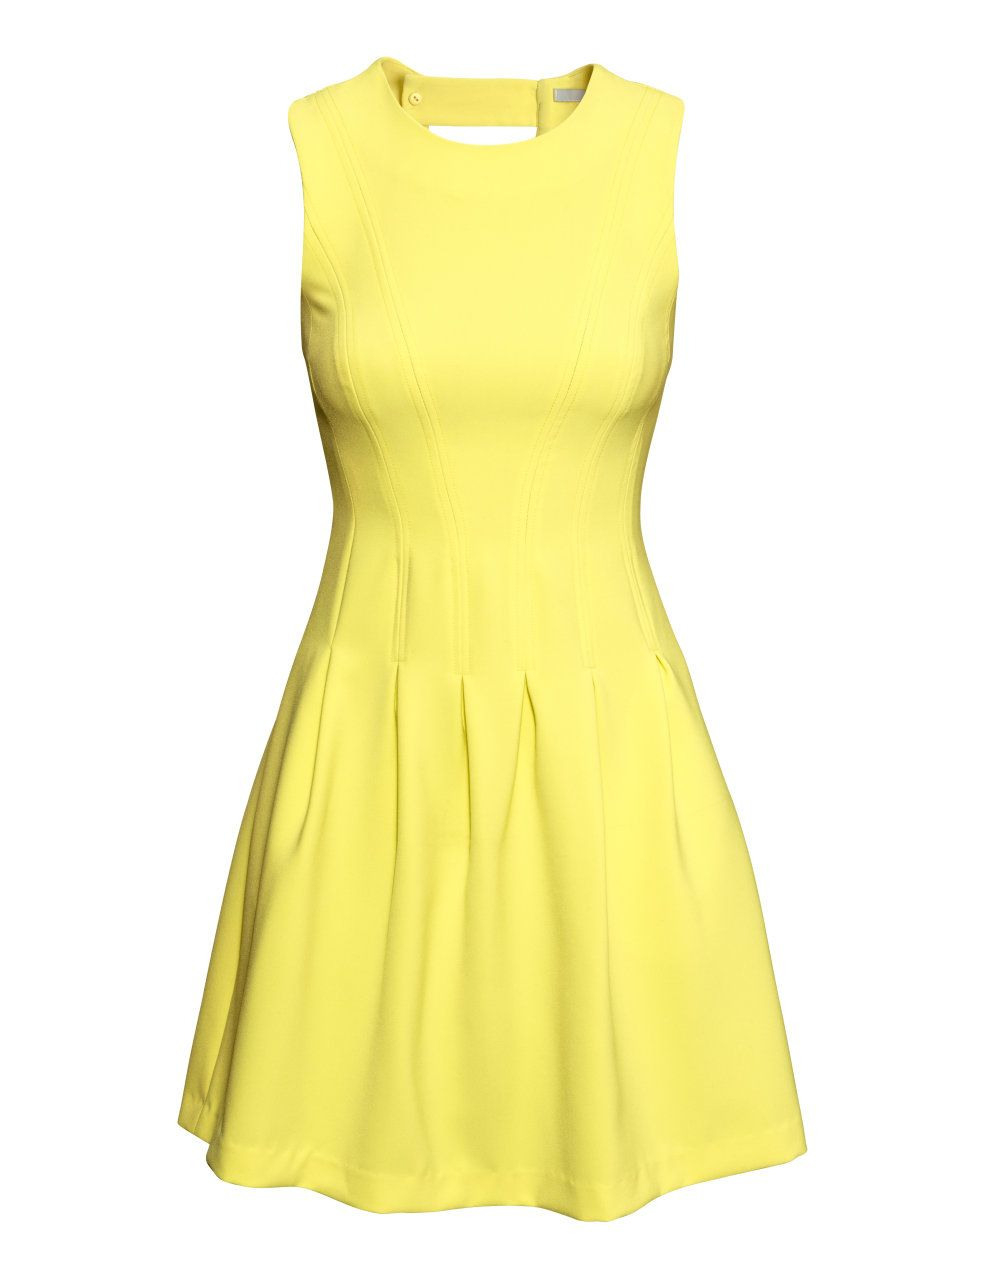 Hm Ärmelloses Kleid 3999  Mode Outfits Frauen Gelbe